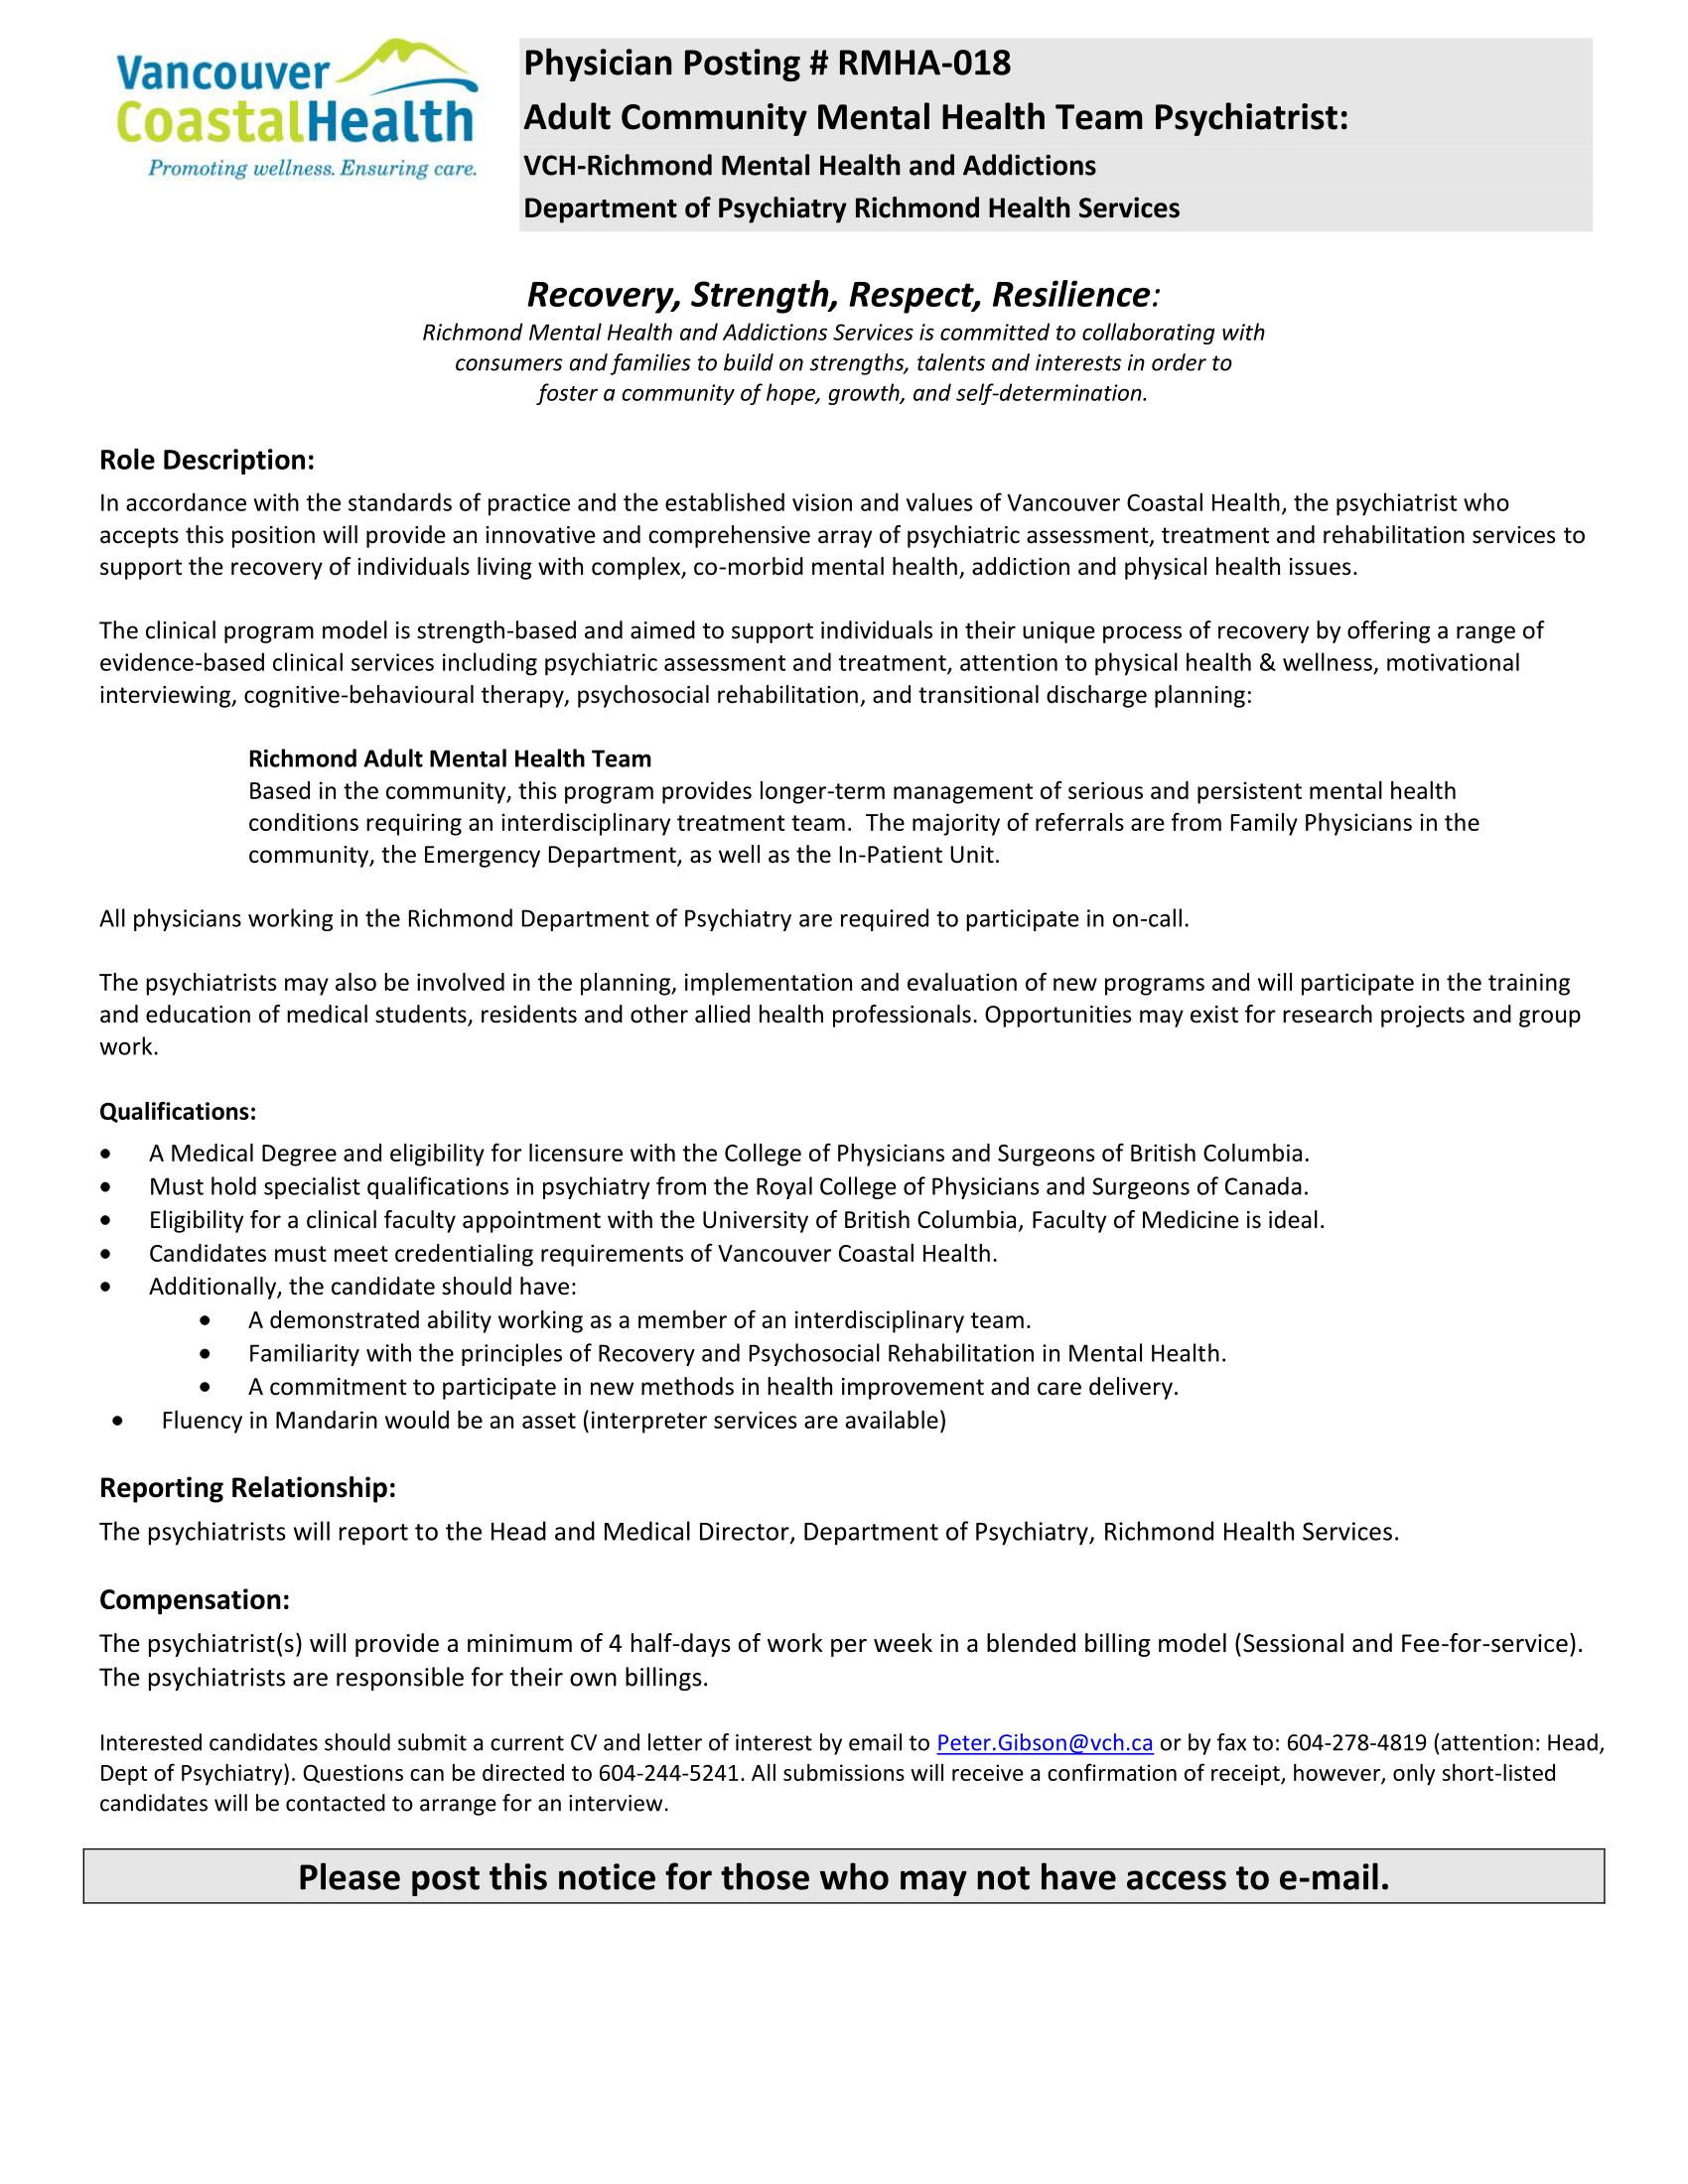 Posting018-RMHT Psychiatrist-1